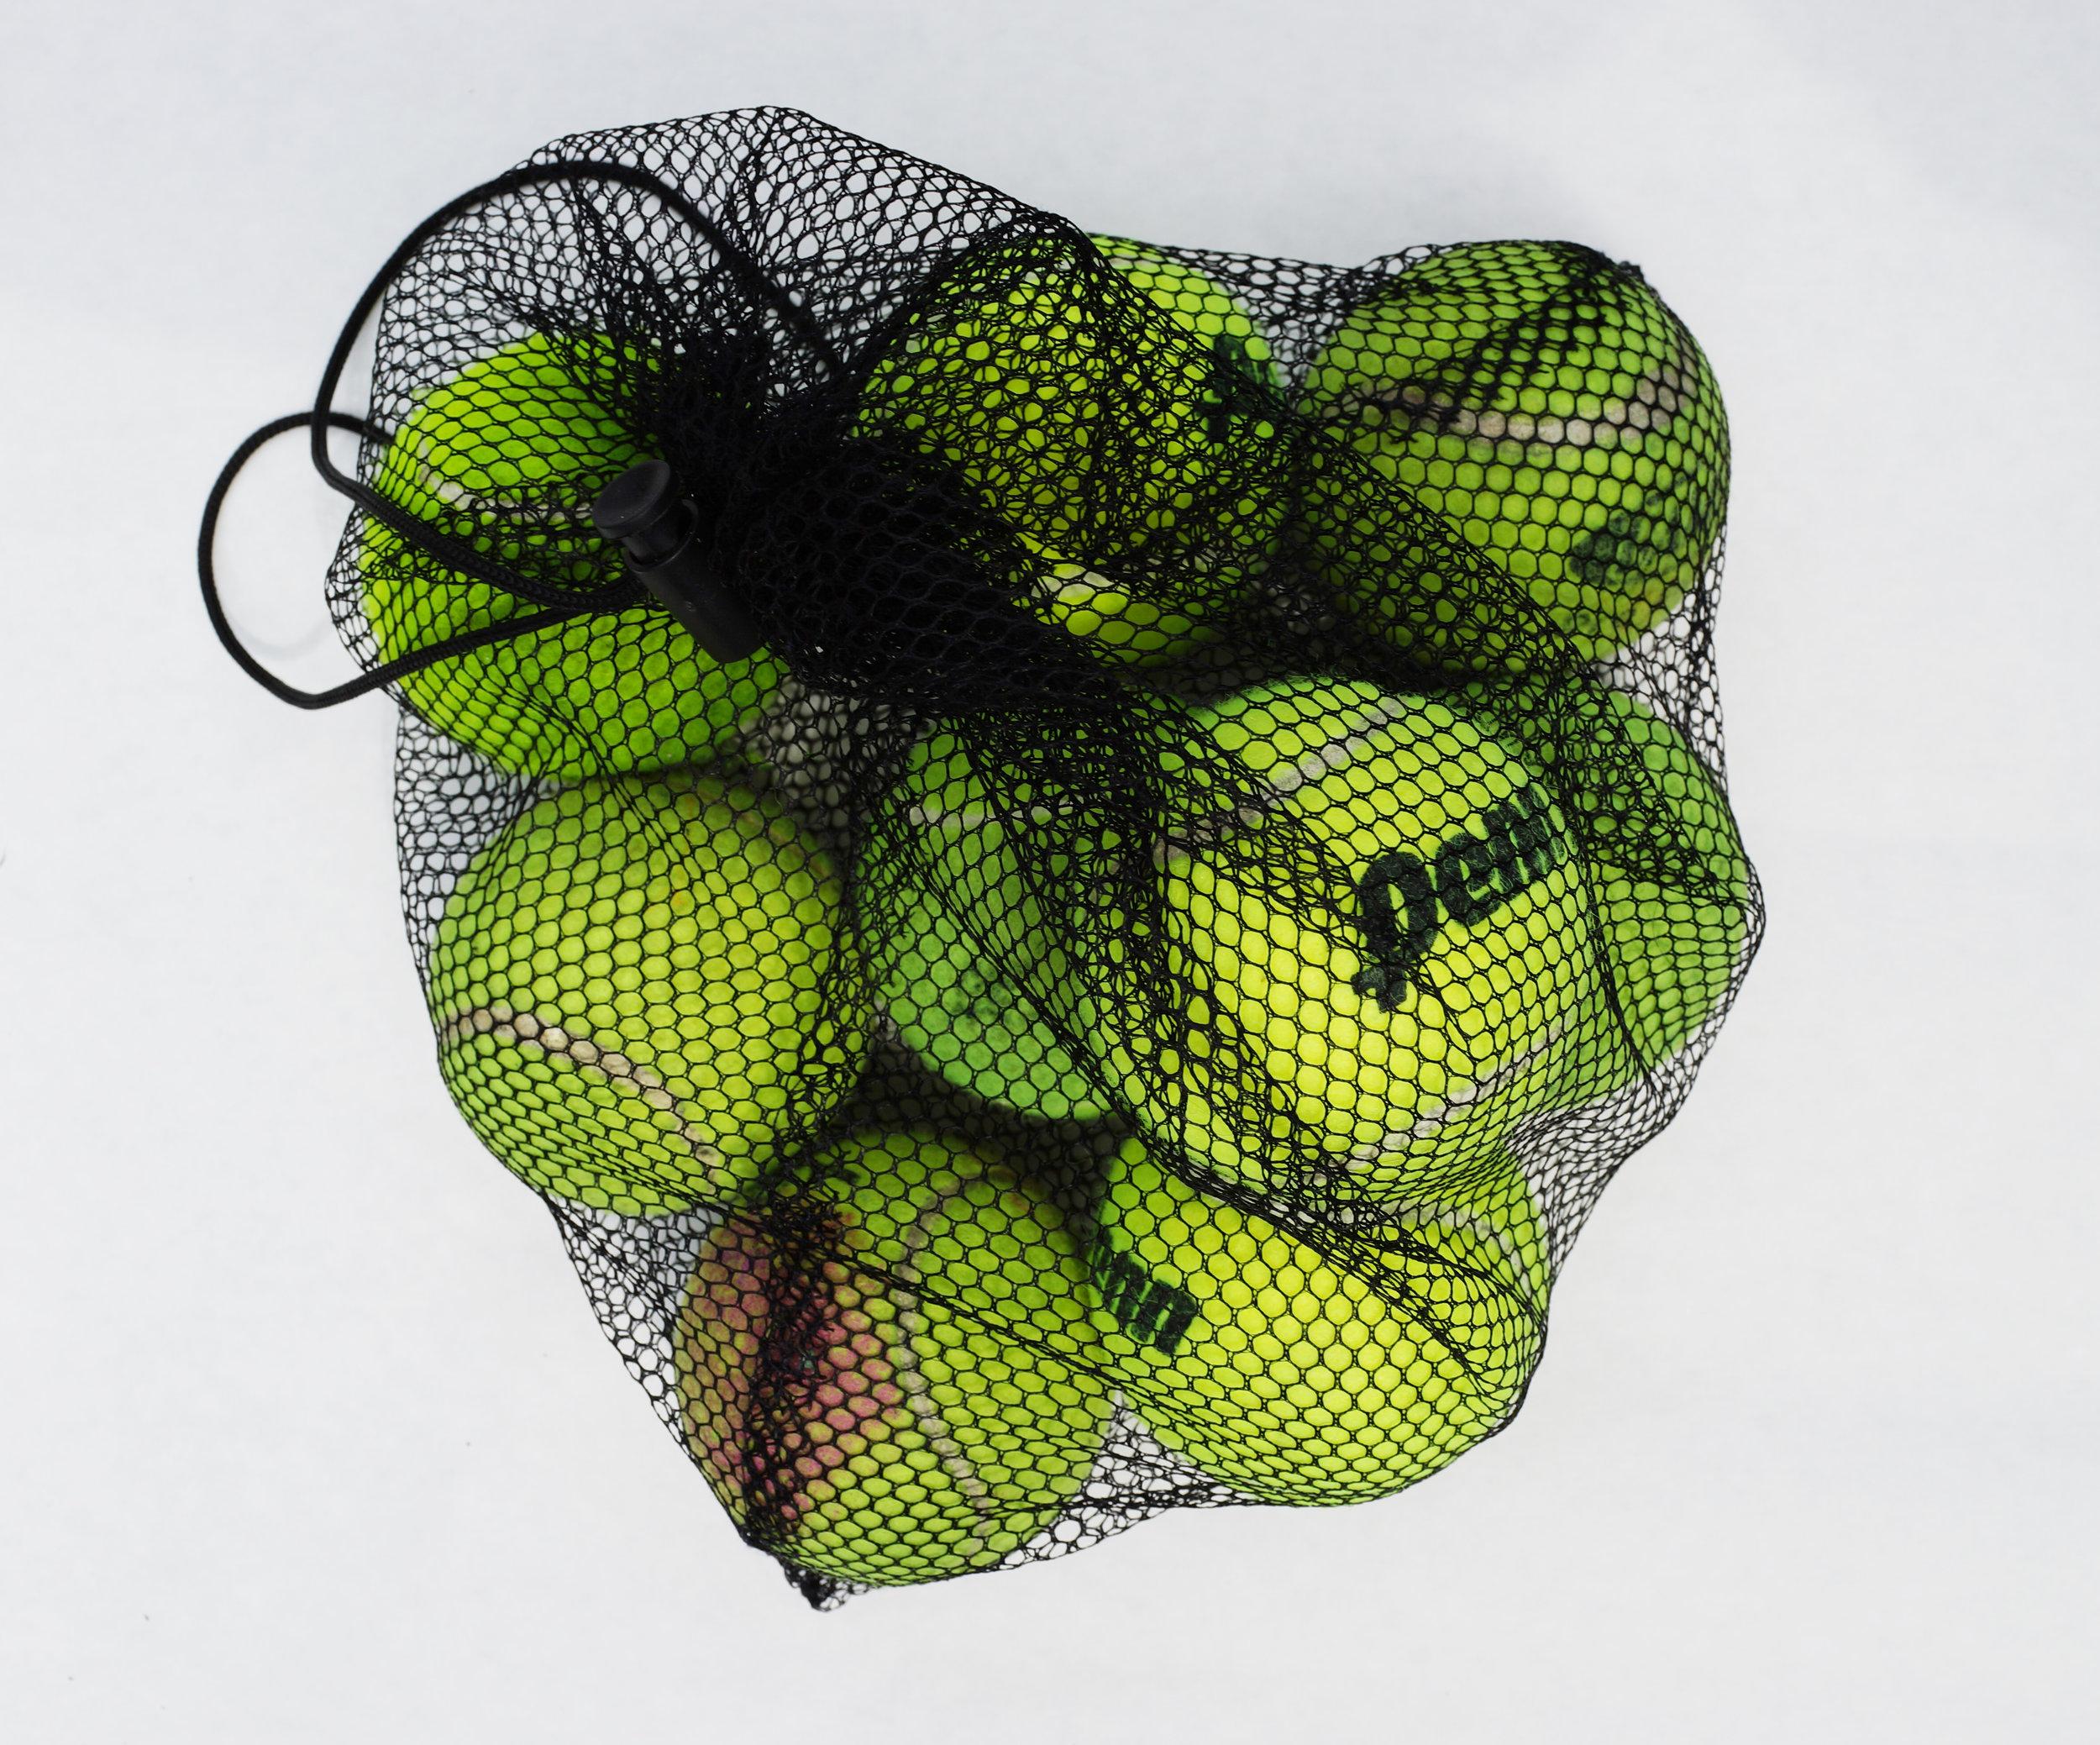 fig,danBag-o-Balls.jpg